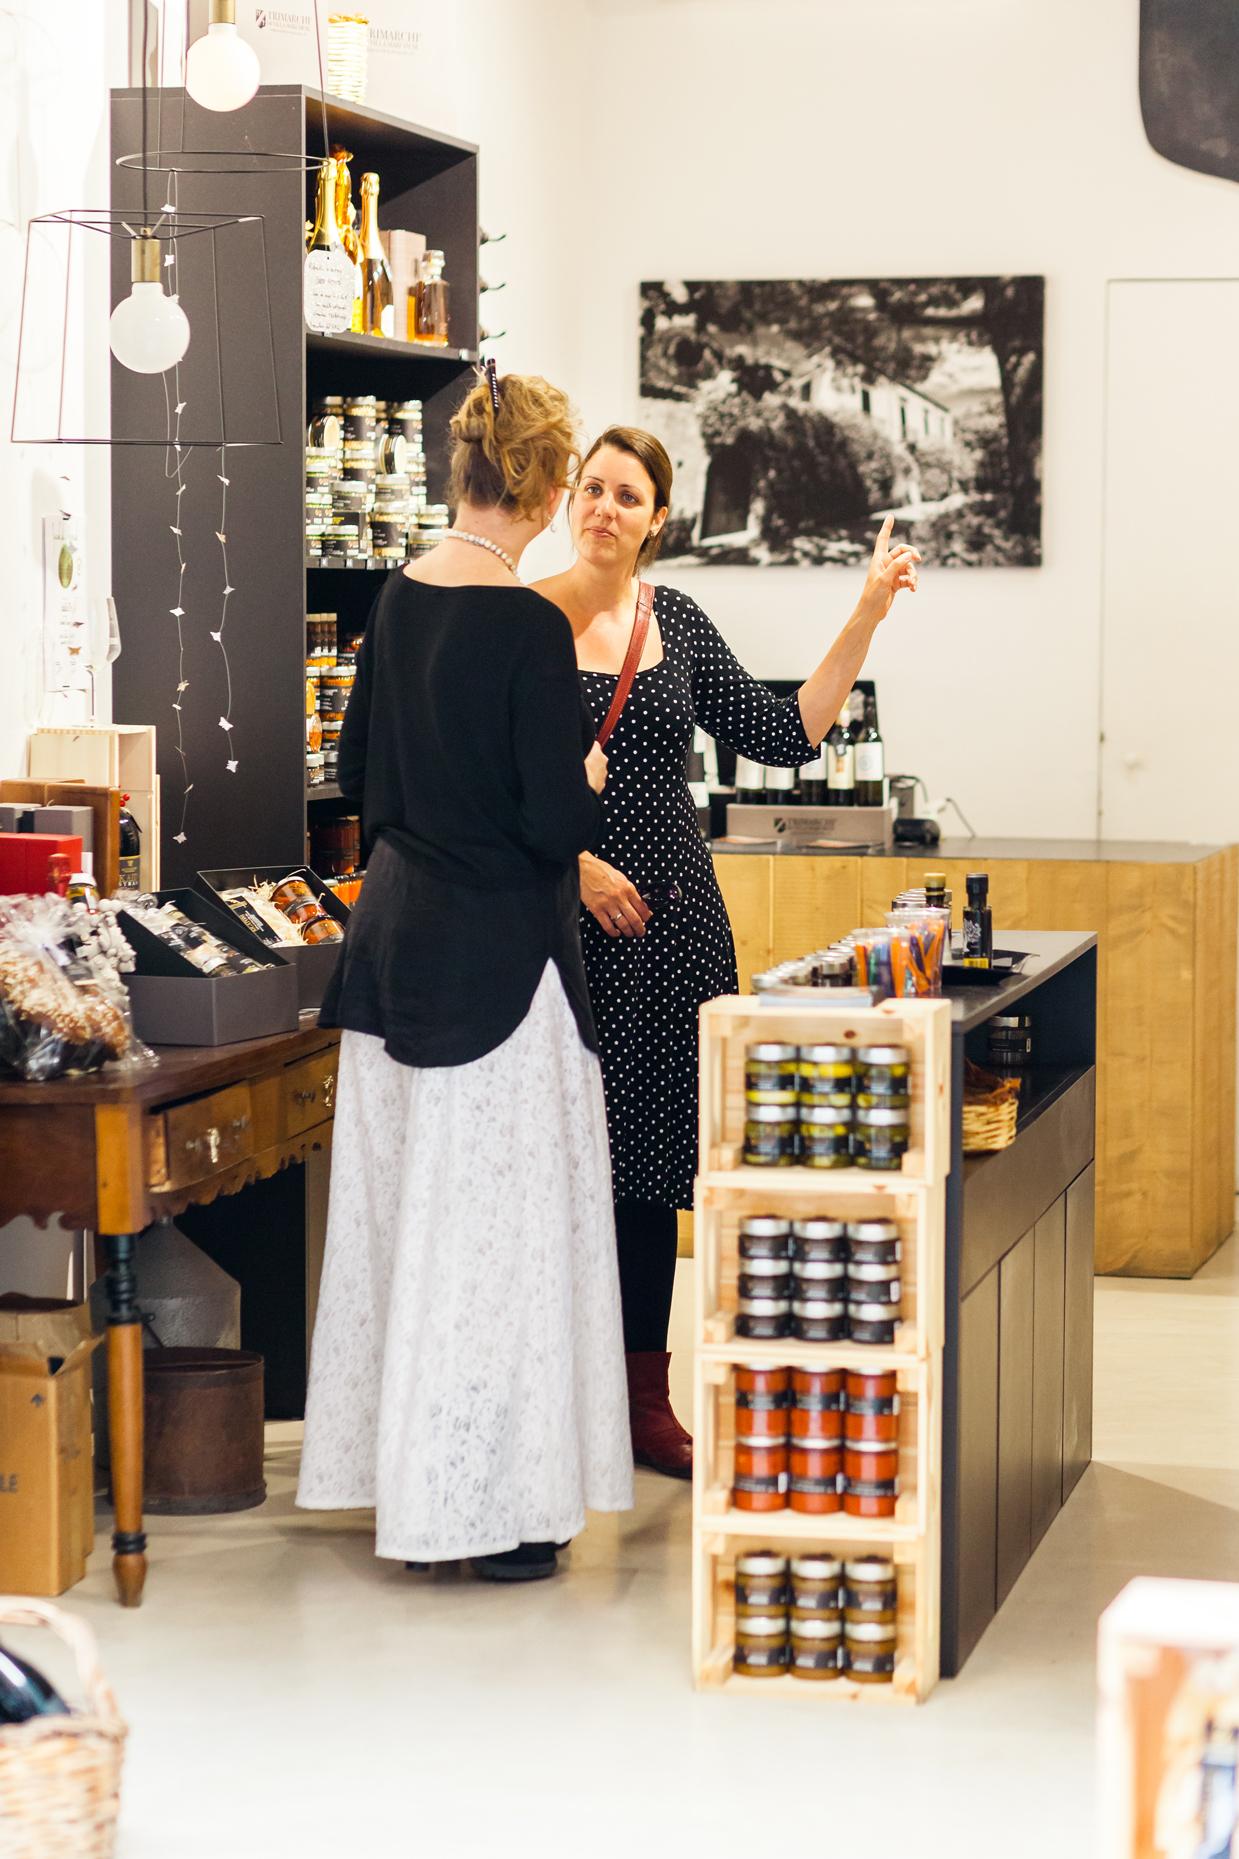 Culinair shoppen in het relaxte Syracuse